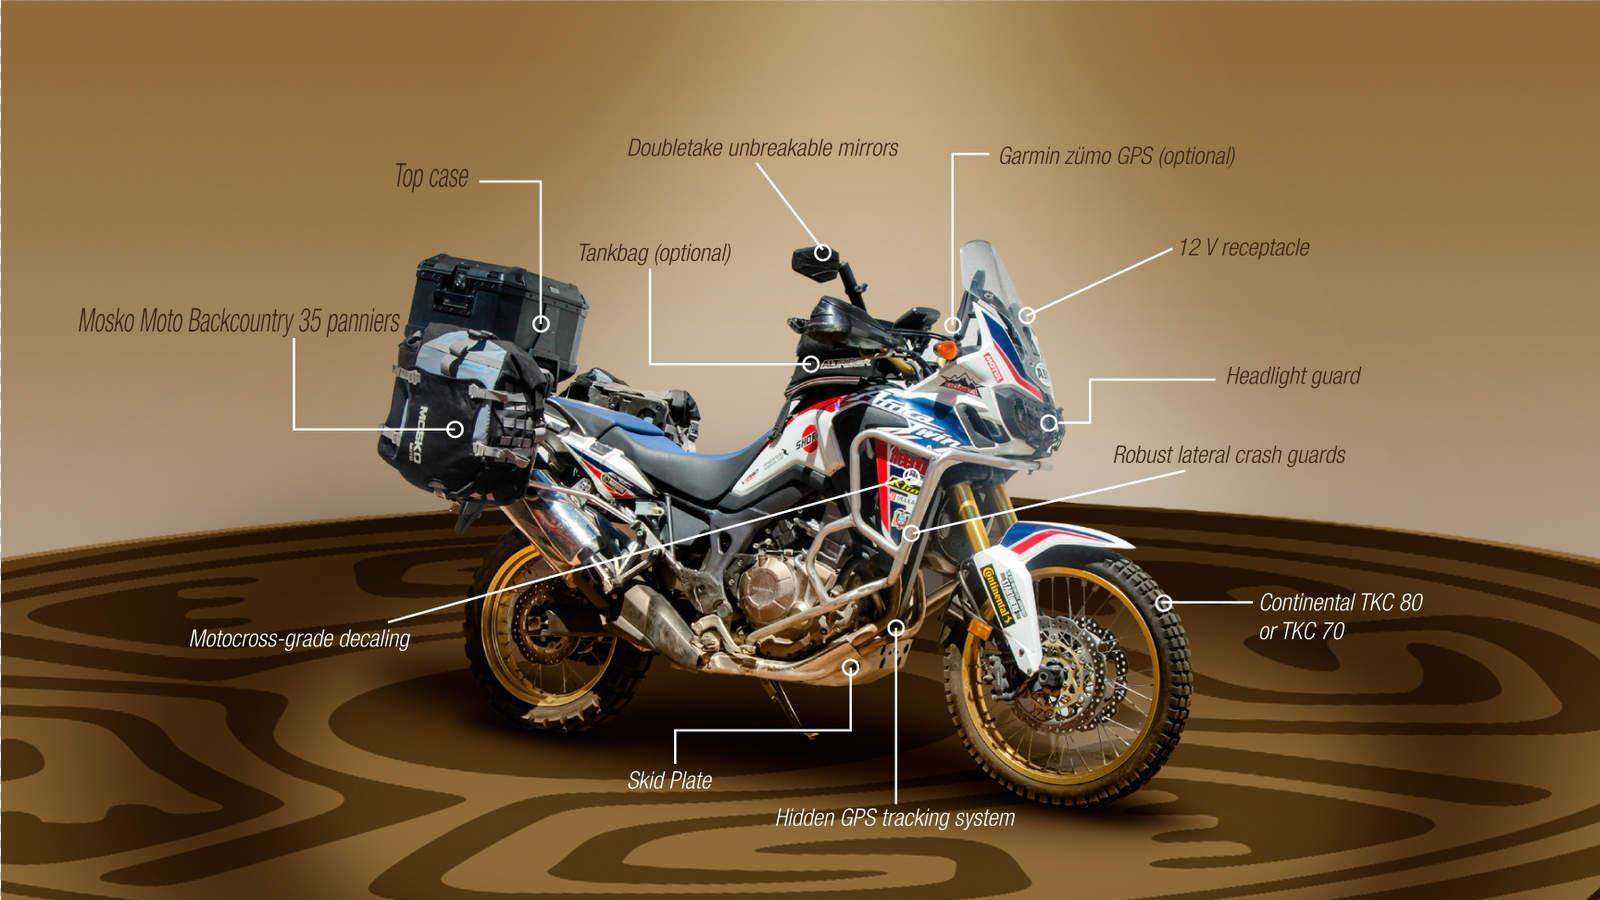 Motorcycle Adventure Tours Motorcycle 4x4 Rental Ecuador